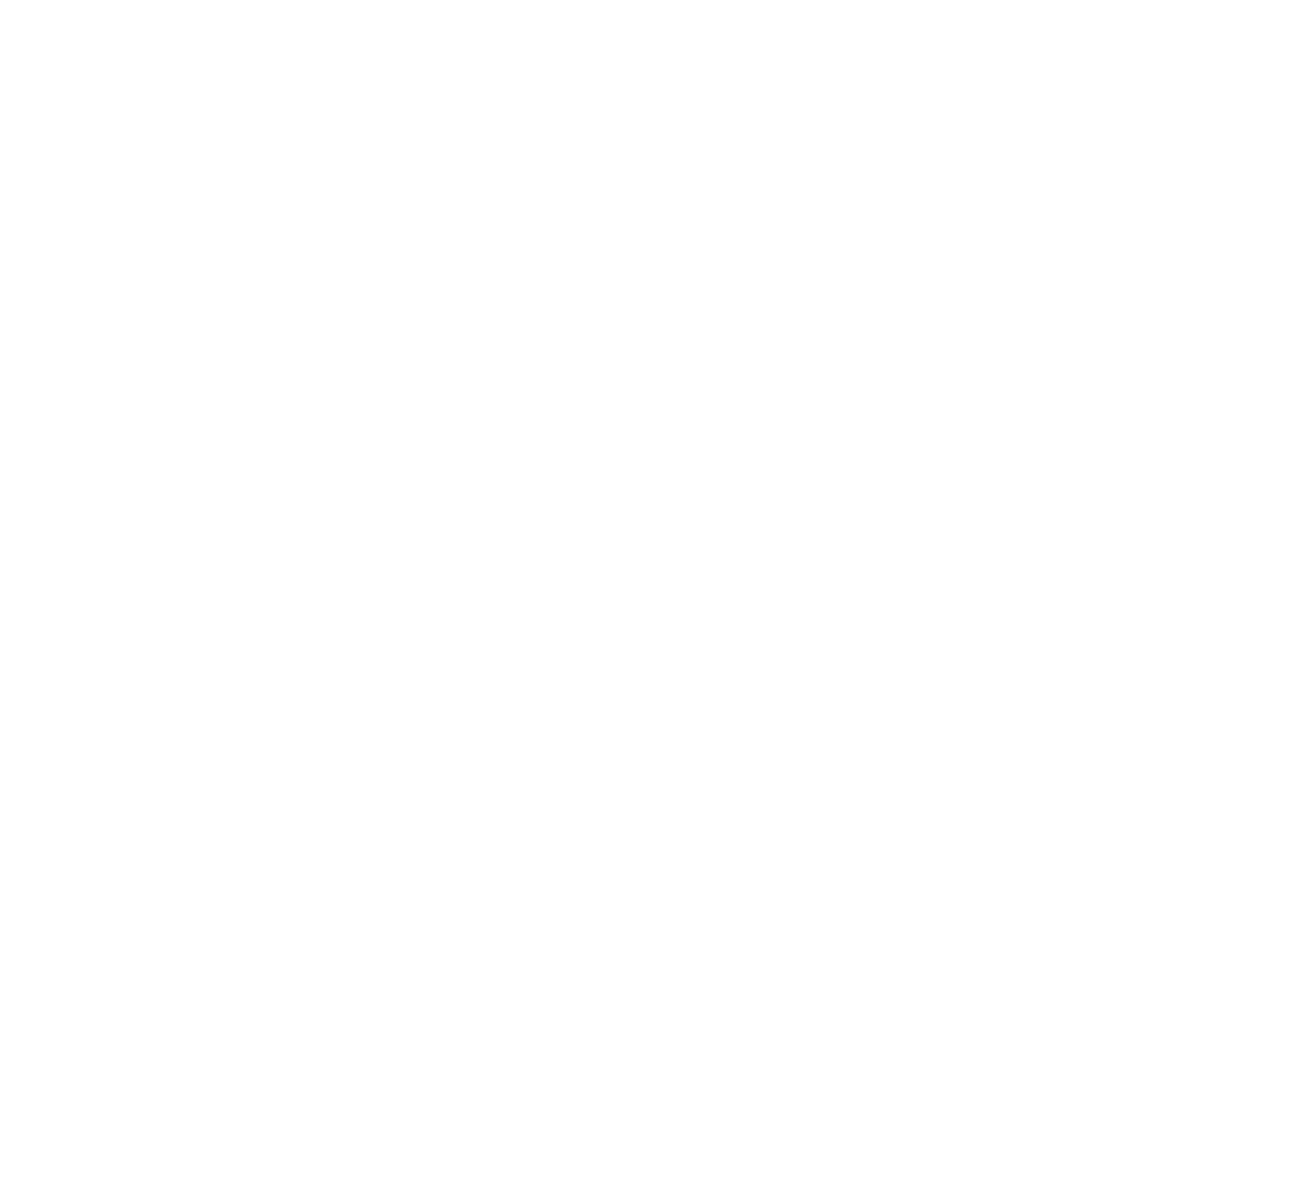 Logo wit hart met Liefdesverklaring